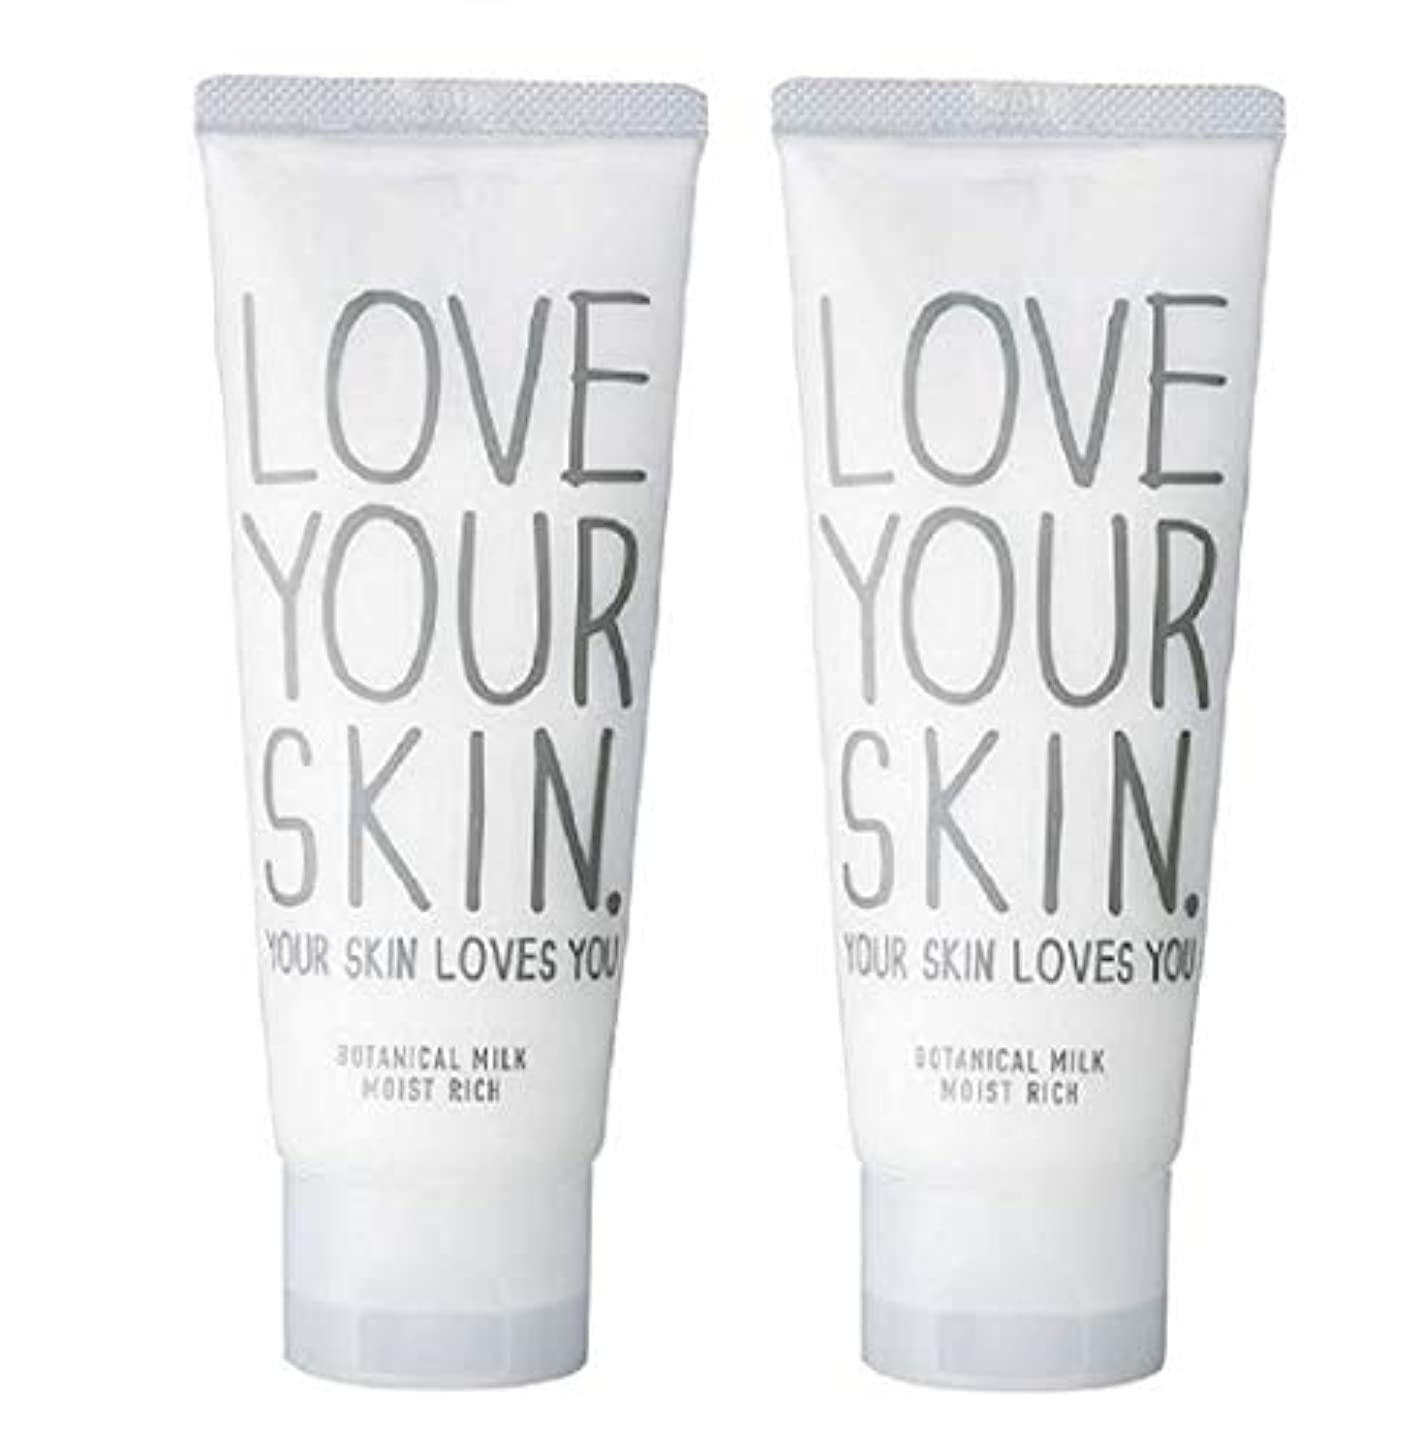 LOVE YOUR SKIN ボタニカルミルク モイストⅡリッチ 乳液100g 2本セット